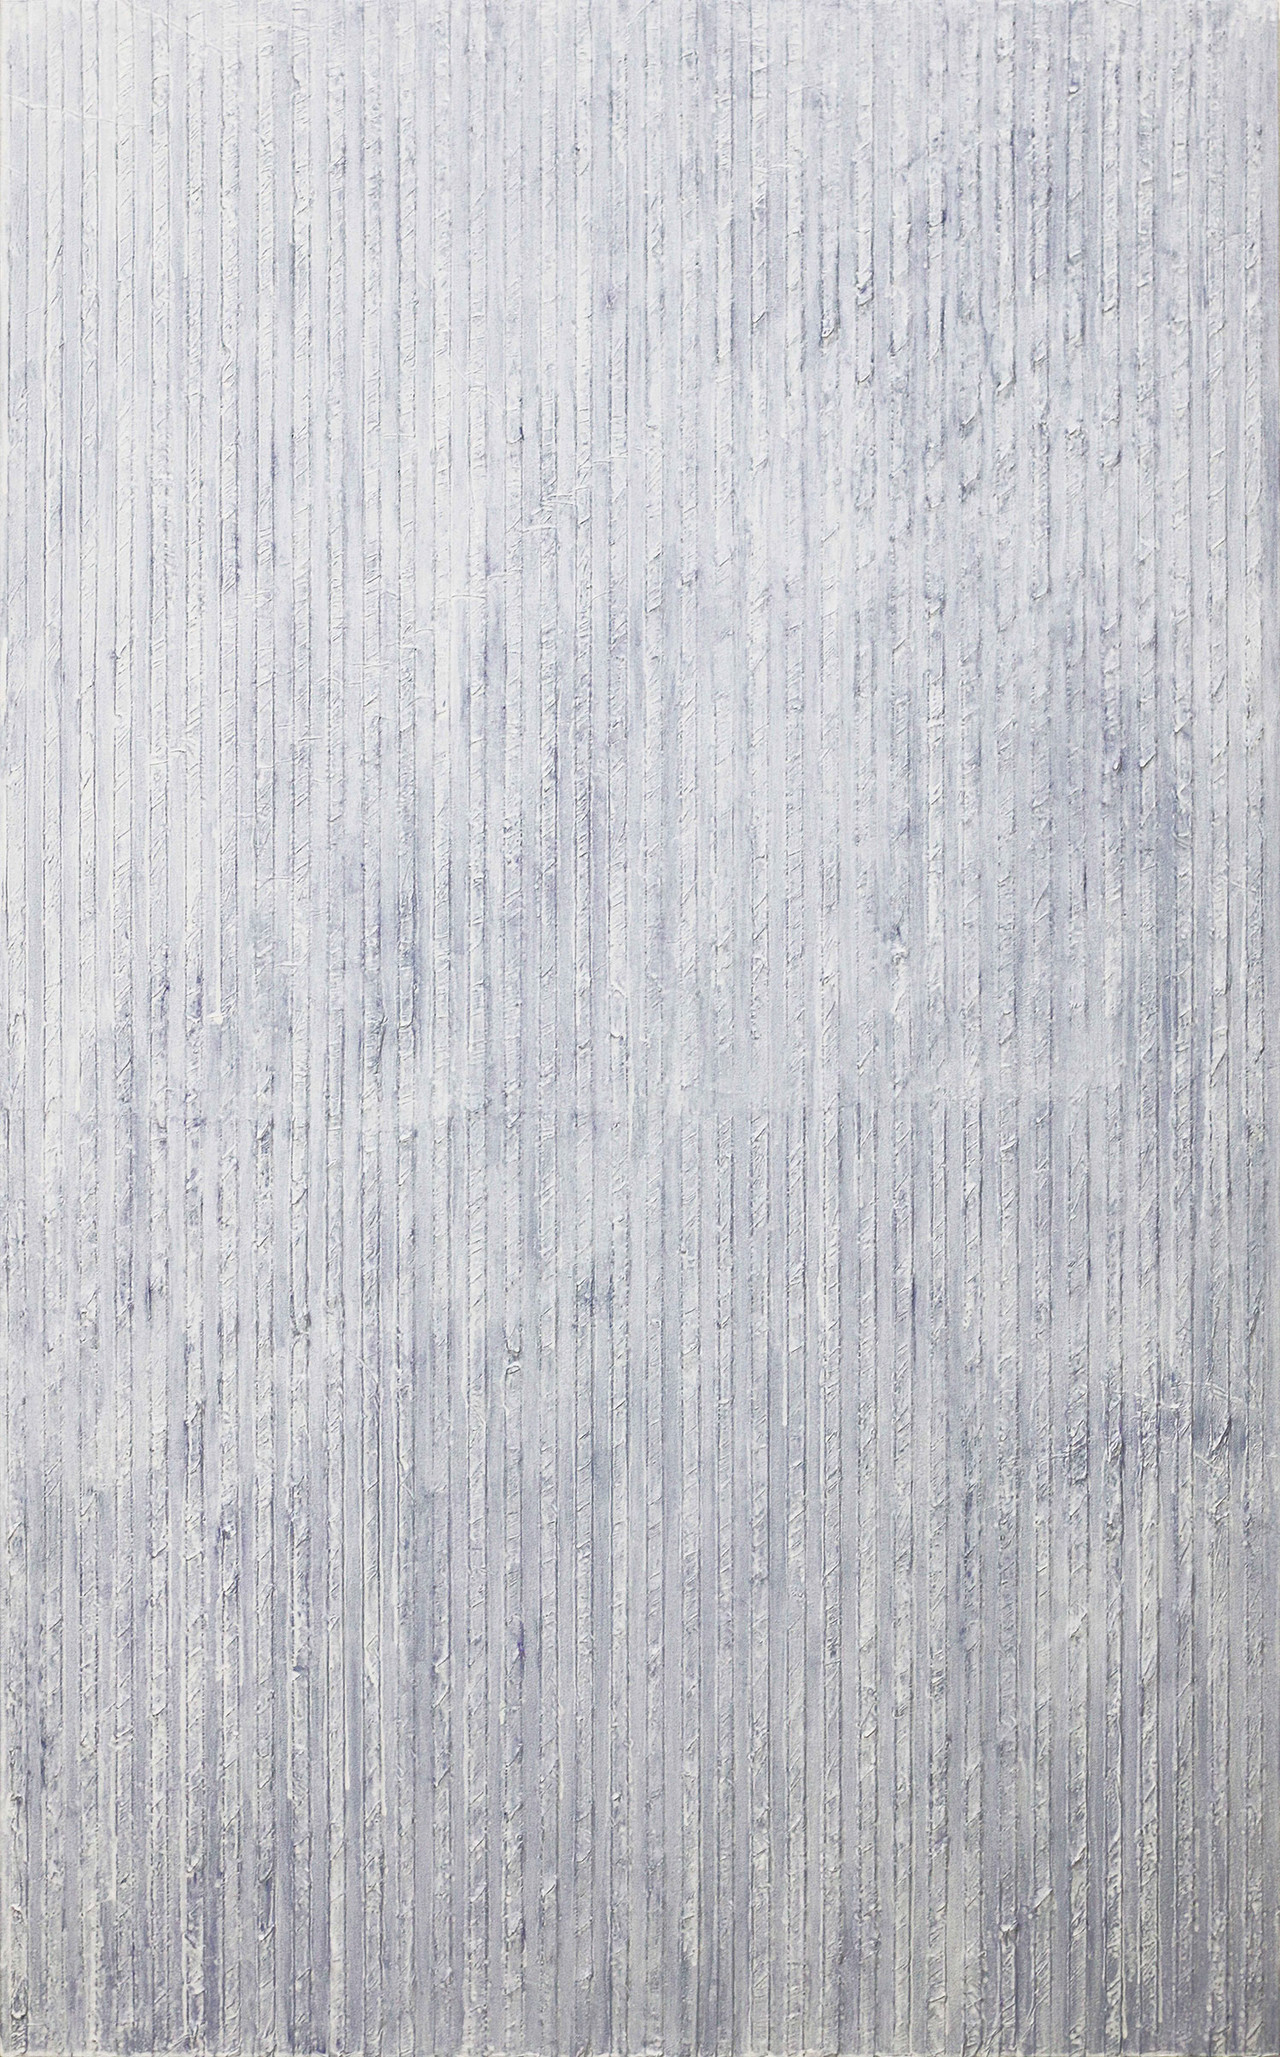 <font color=white><br><h4>김동형, Equilibrium#210330.98</h4>